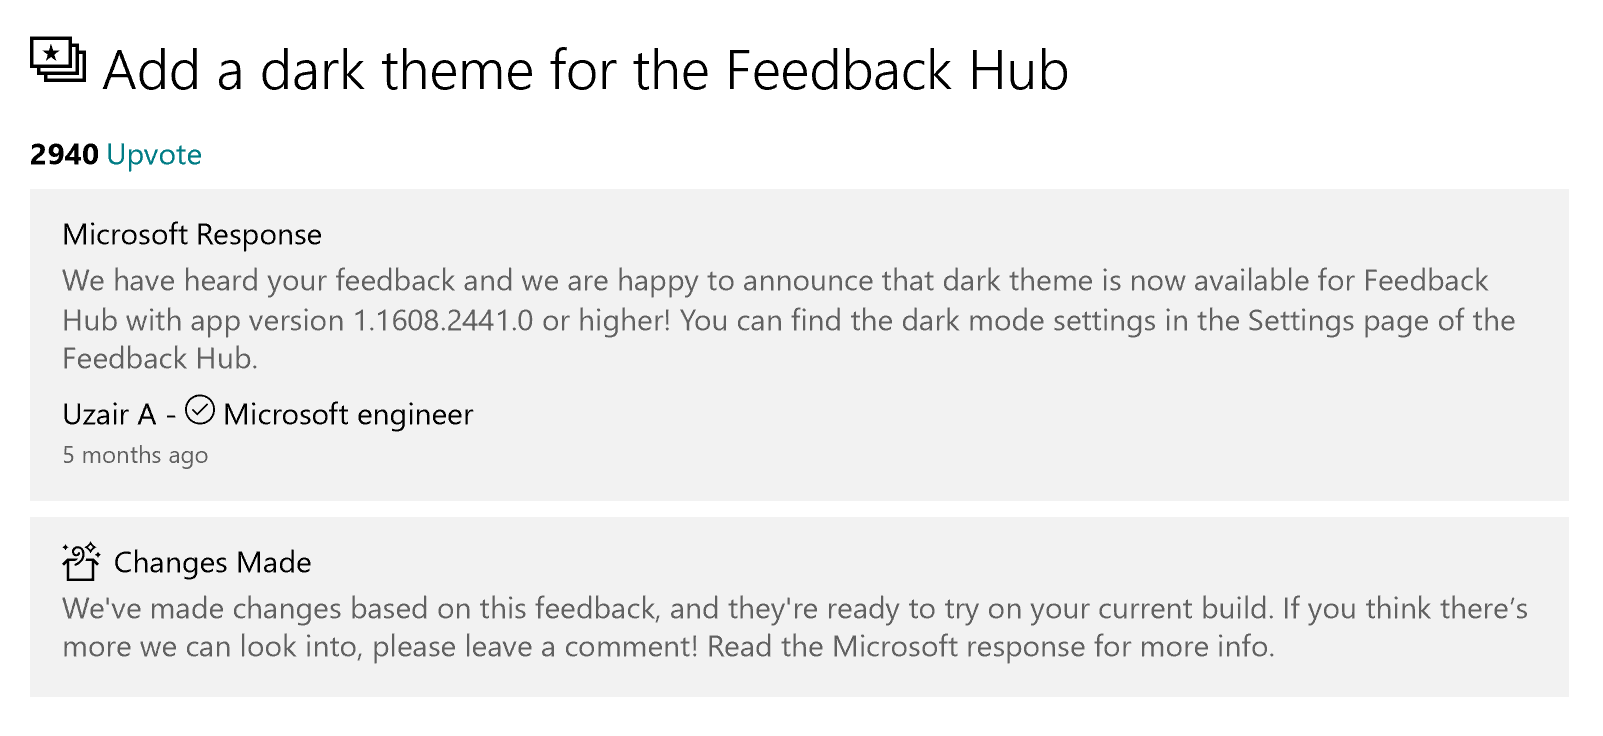 Microsoft Response to Add a dark theme for the Feedback Hub